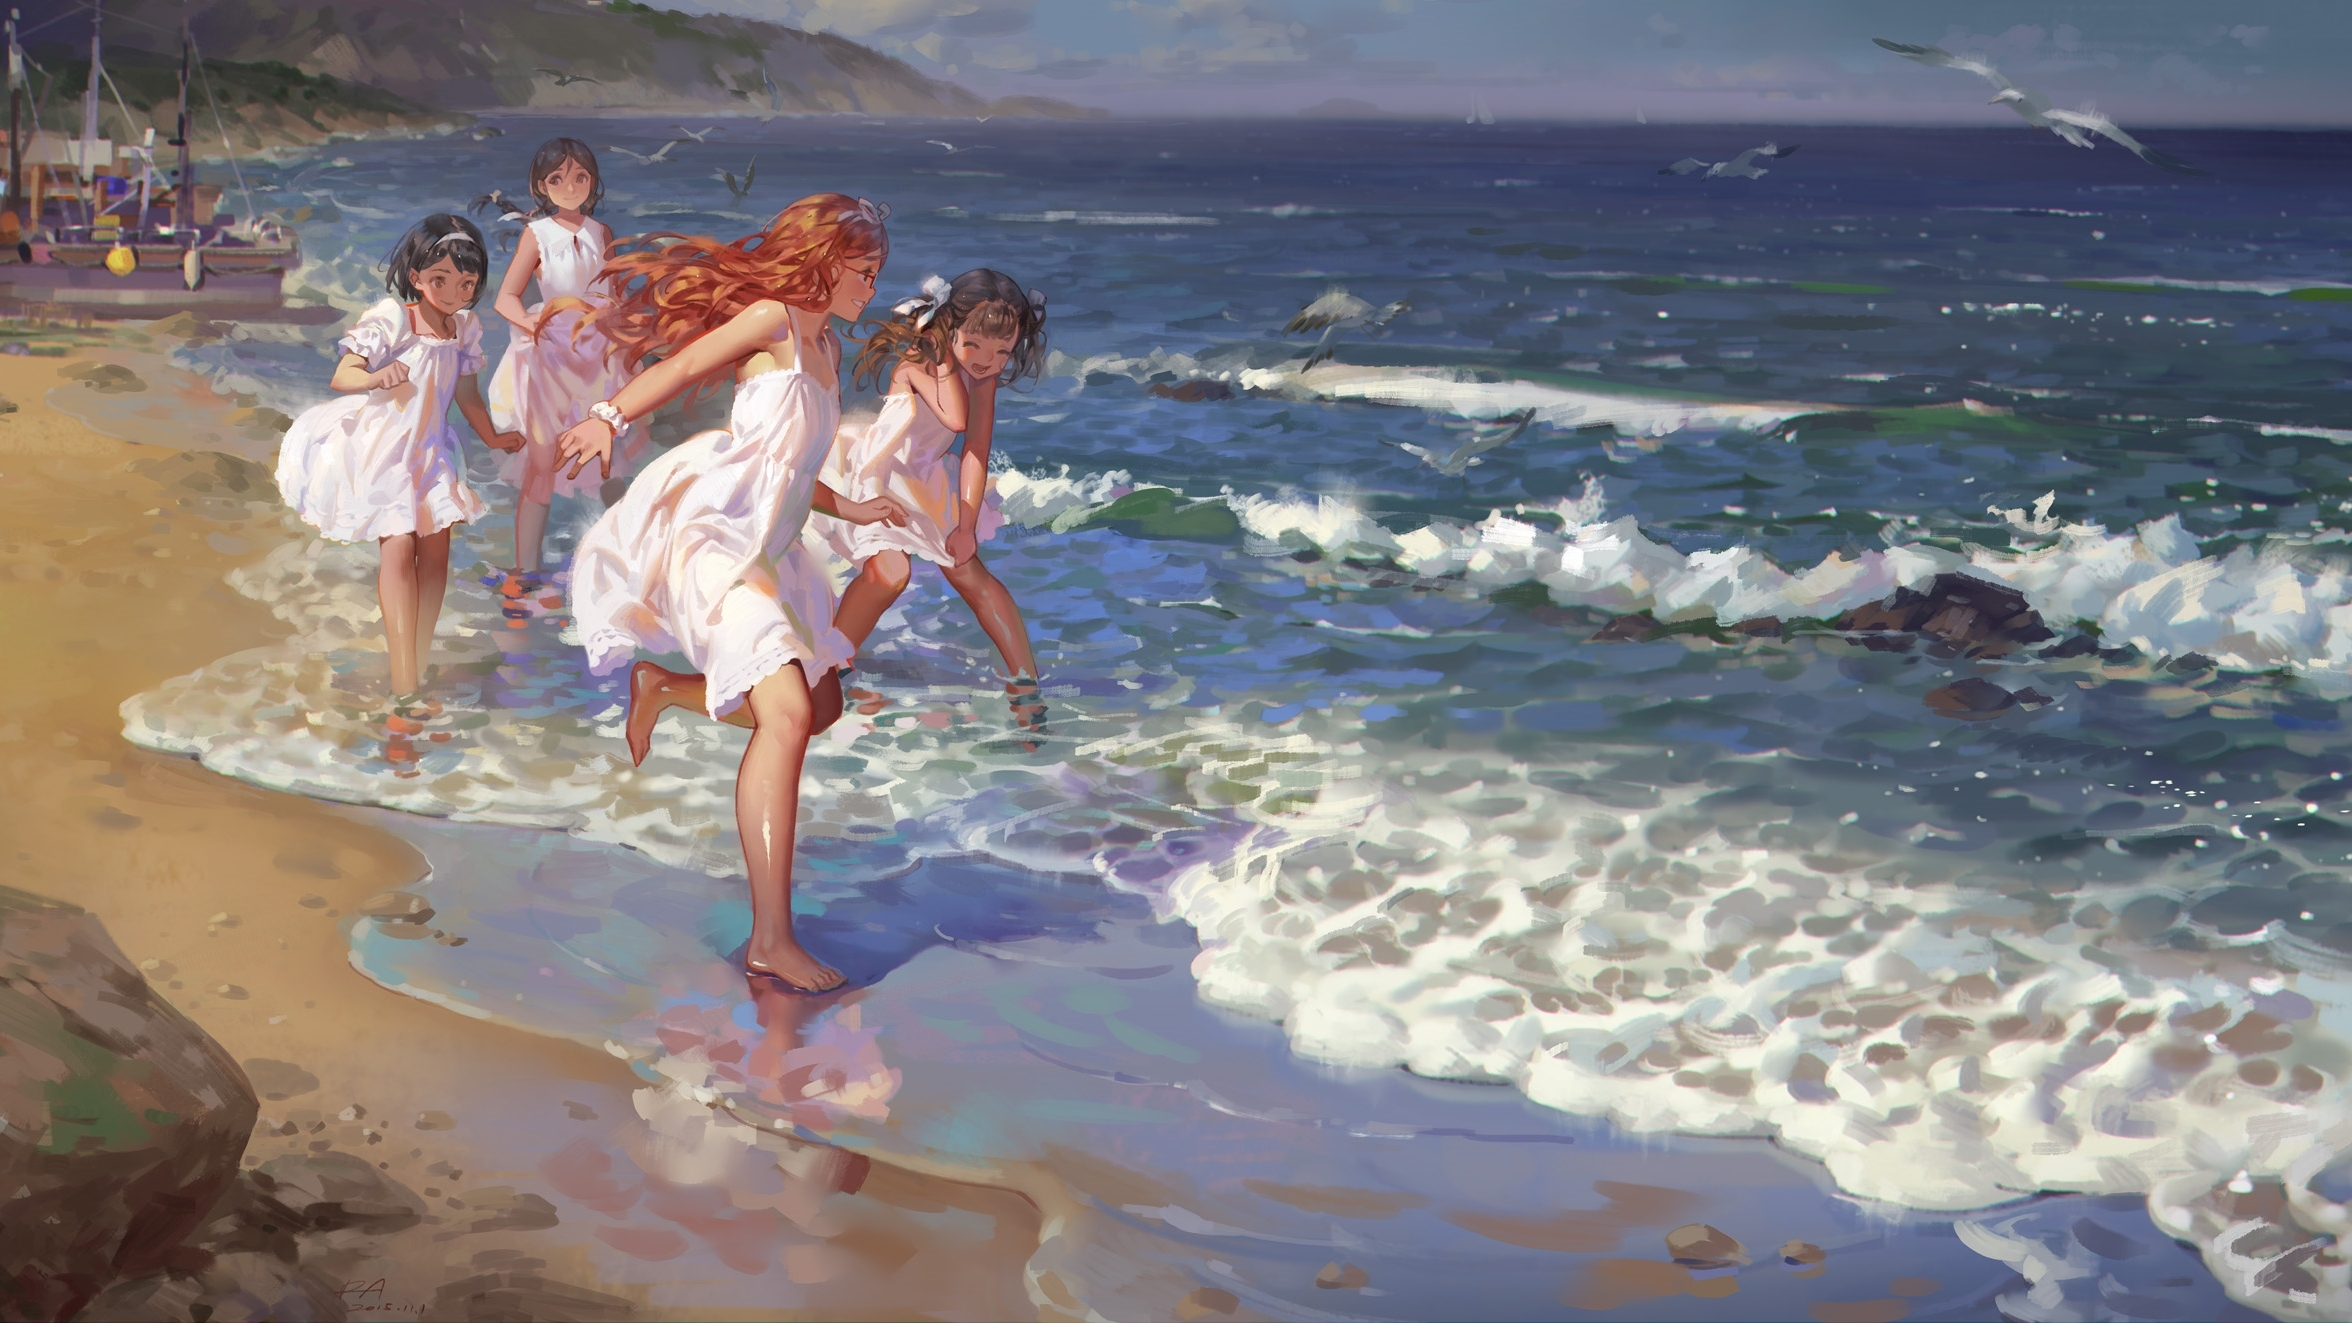 Anime 2352x1323 beach sand waves dress sea loli